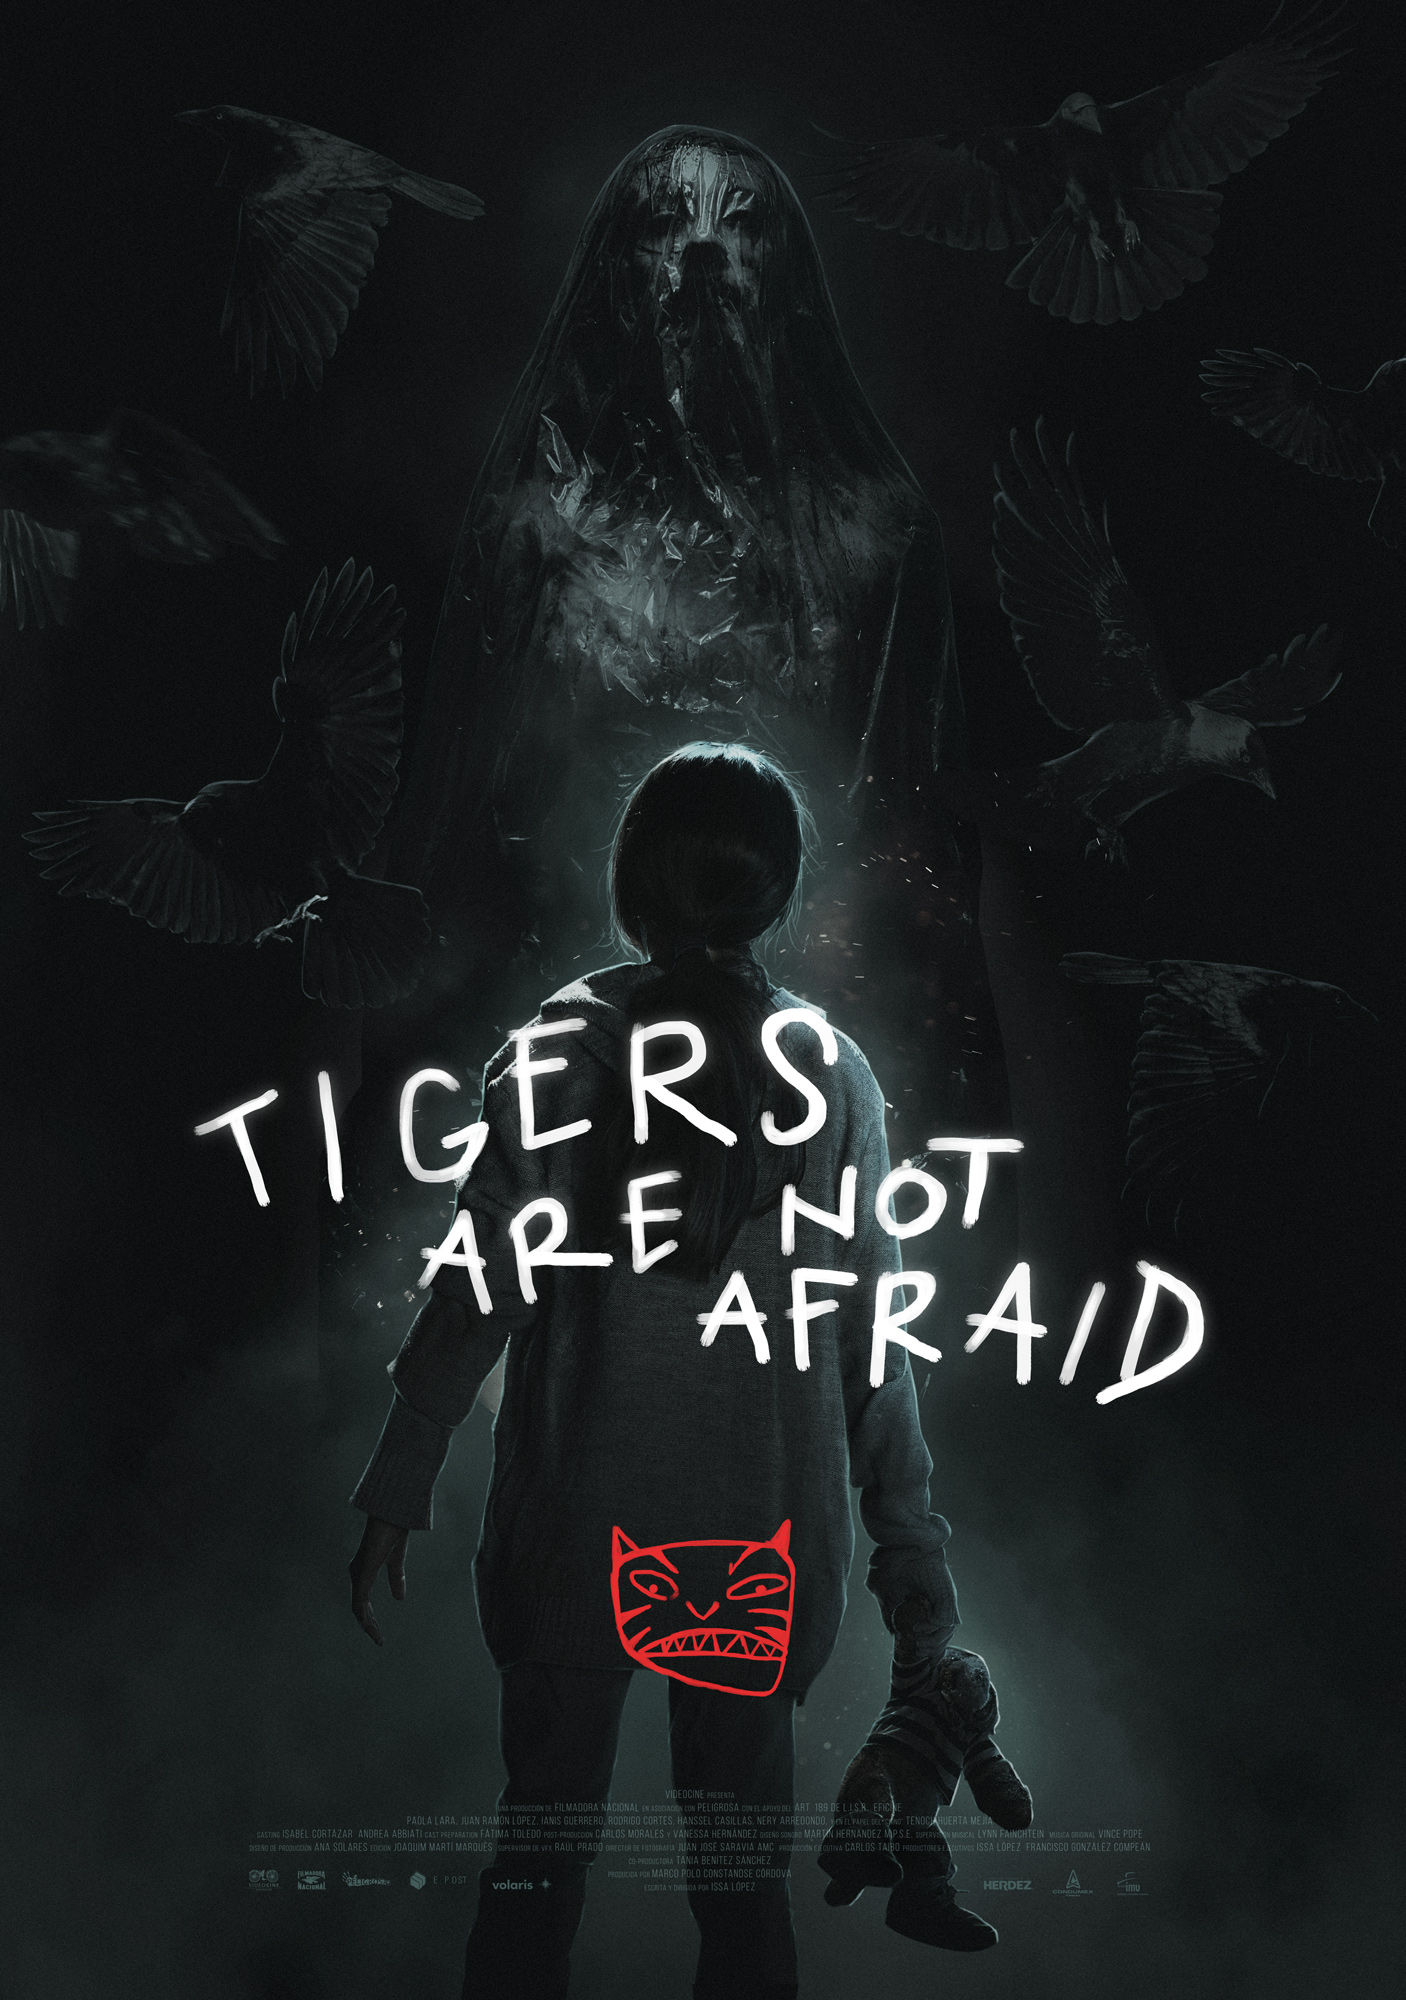 Afraid Trailer, Tigers Are Not Afraid Shudder, Shudder